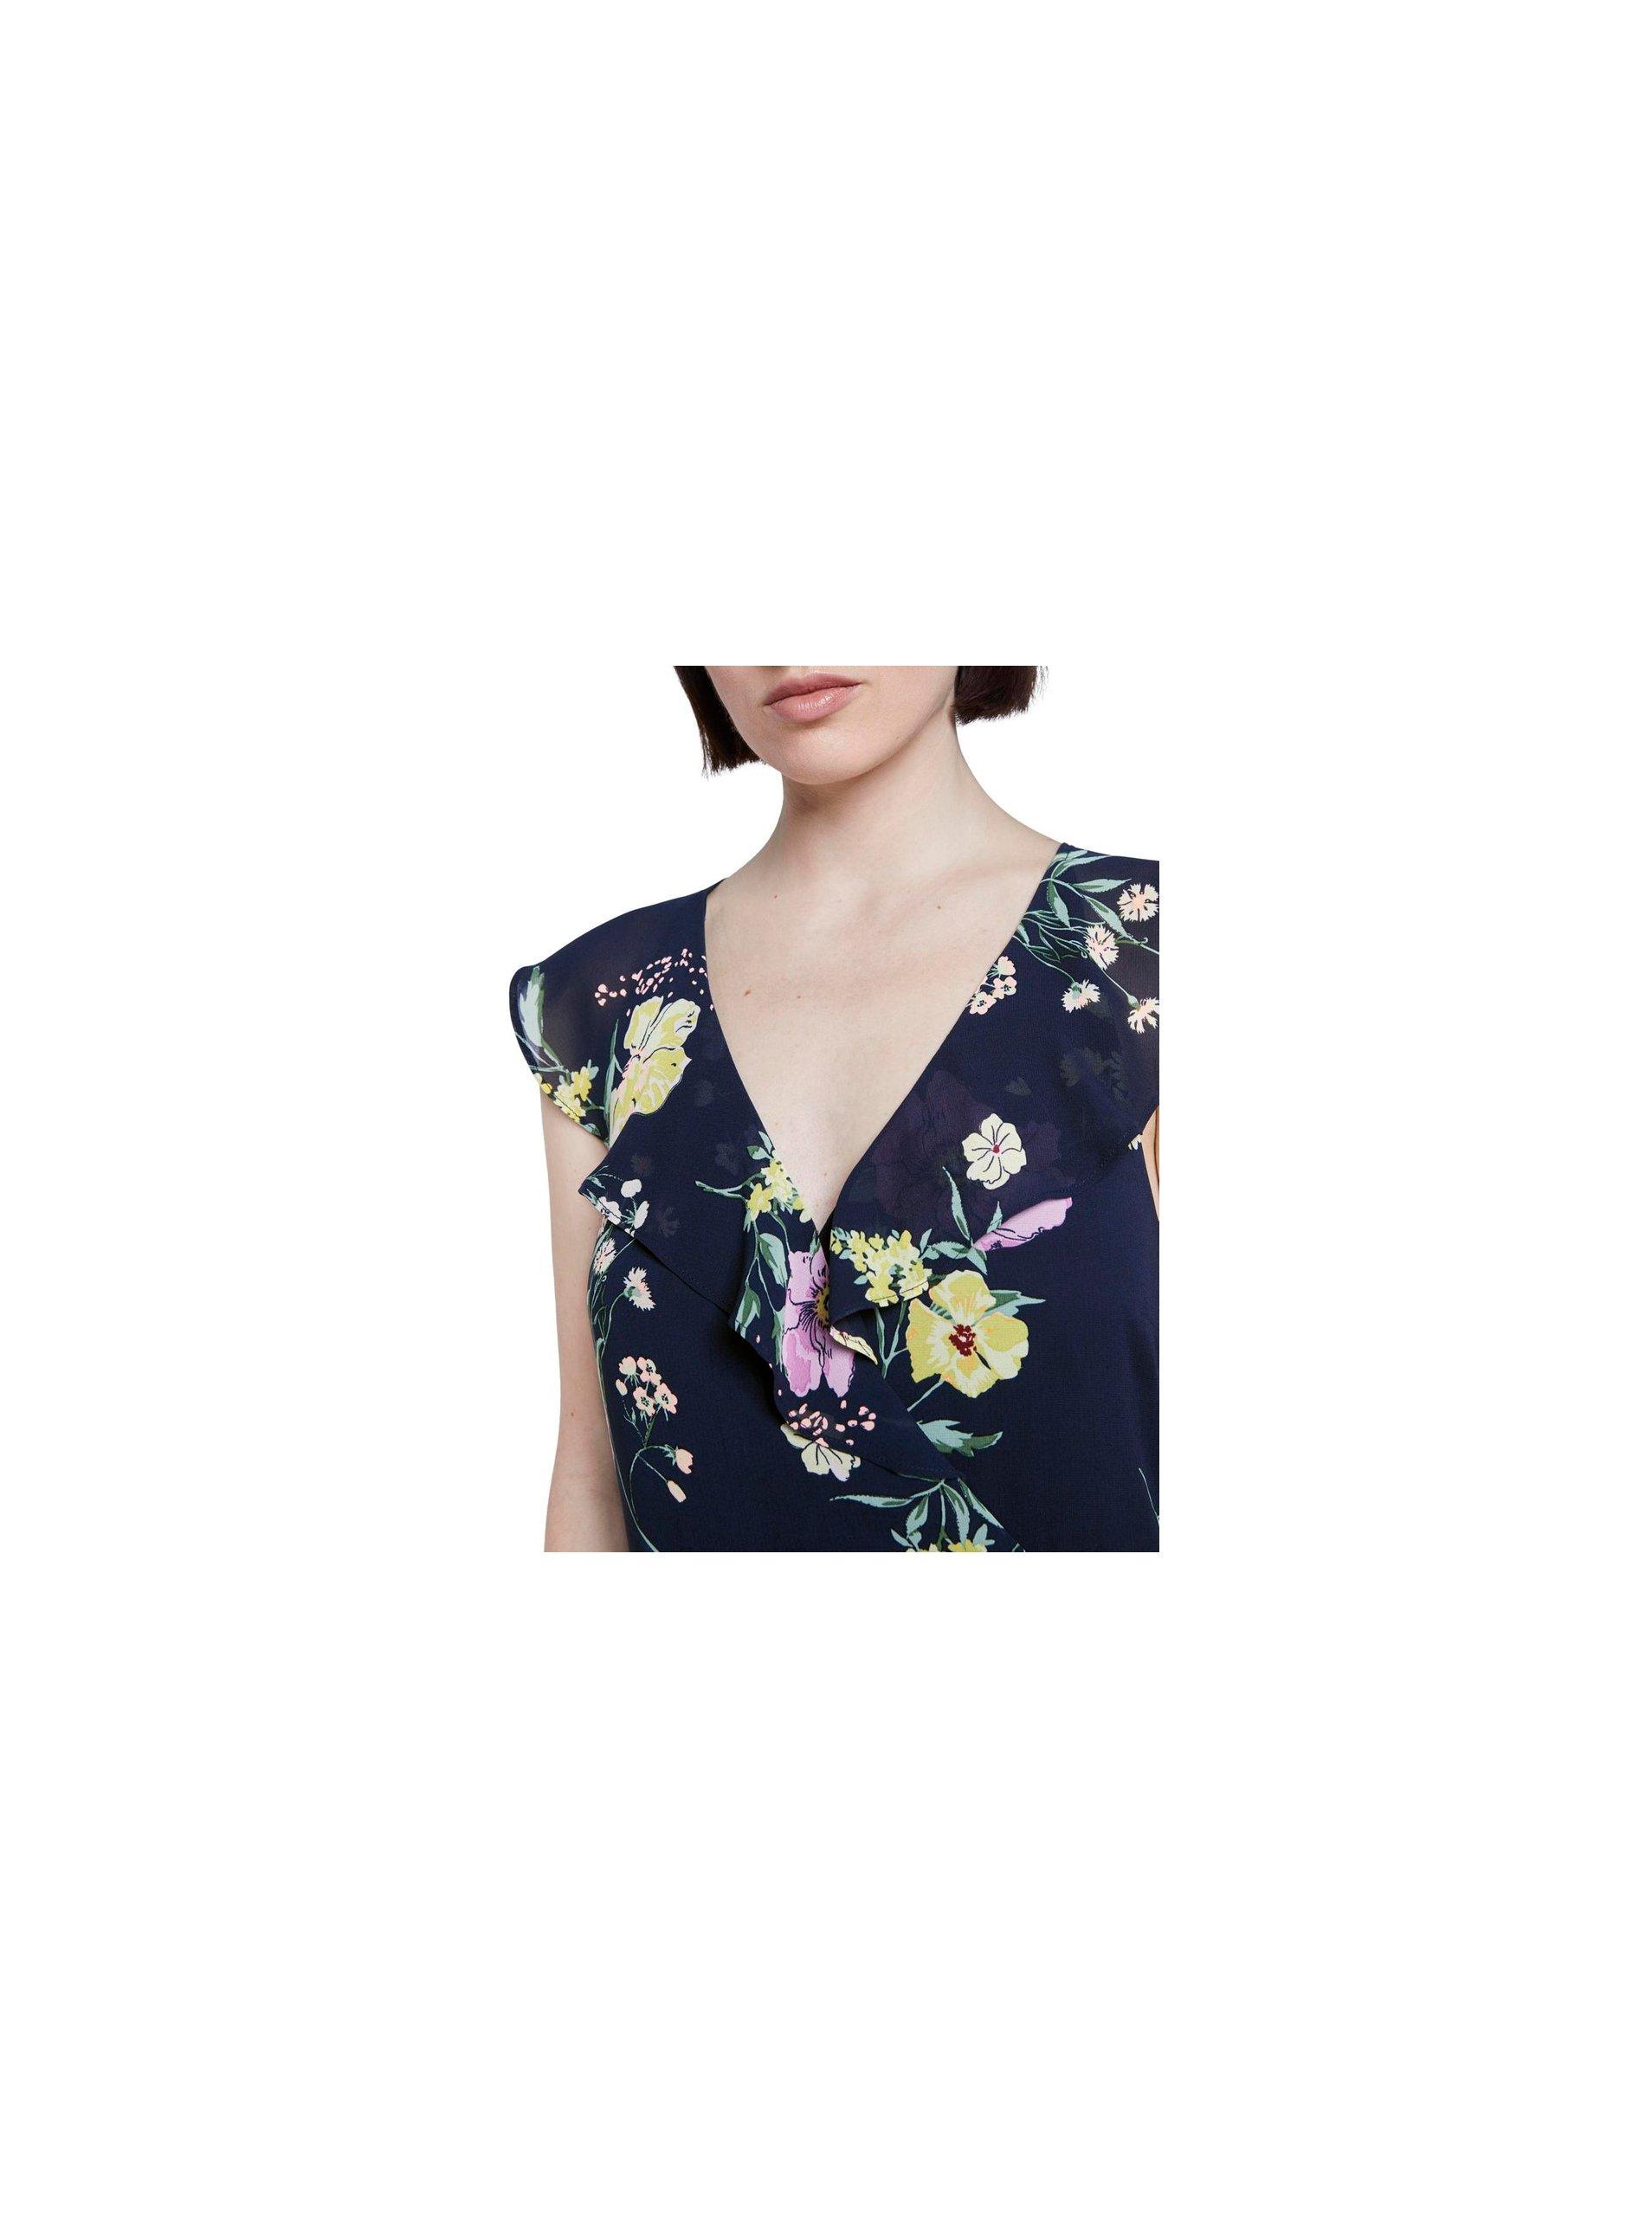 Tmavomodré dámske kvetované maxišaty Tom Tailor Denim.